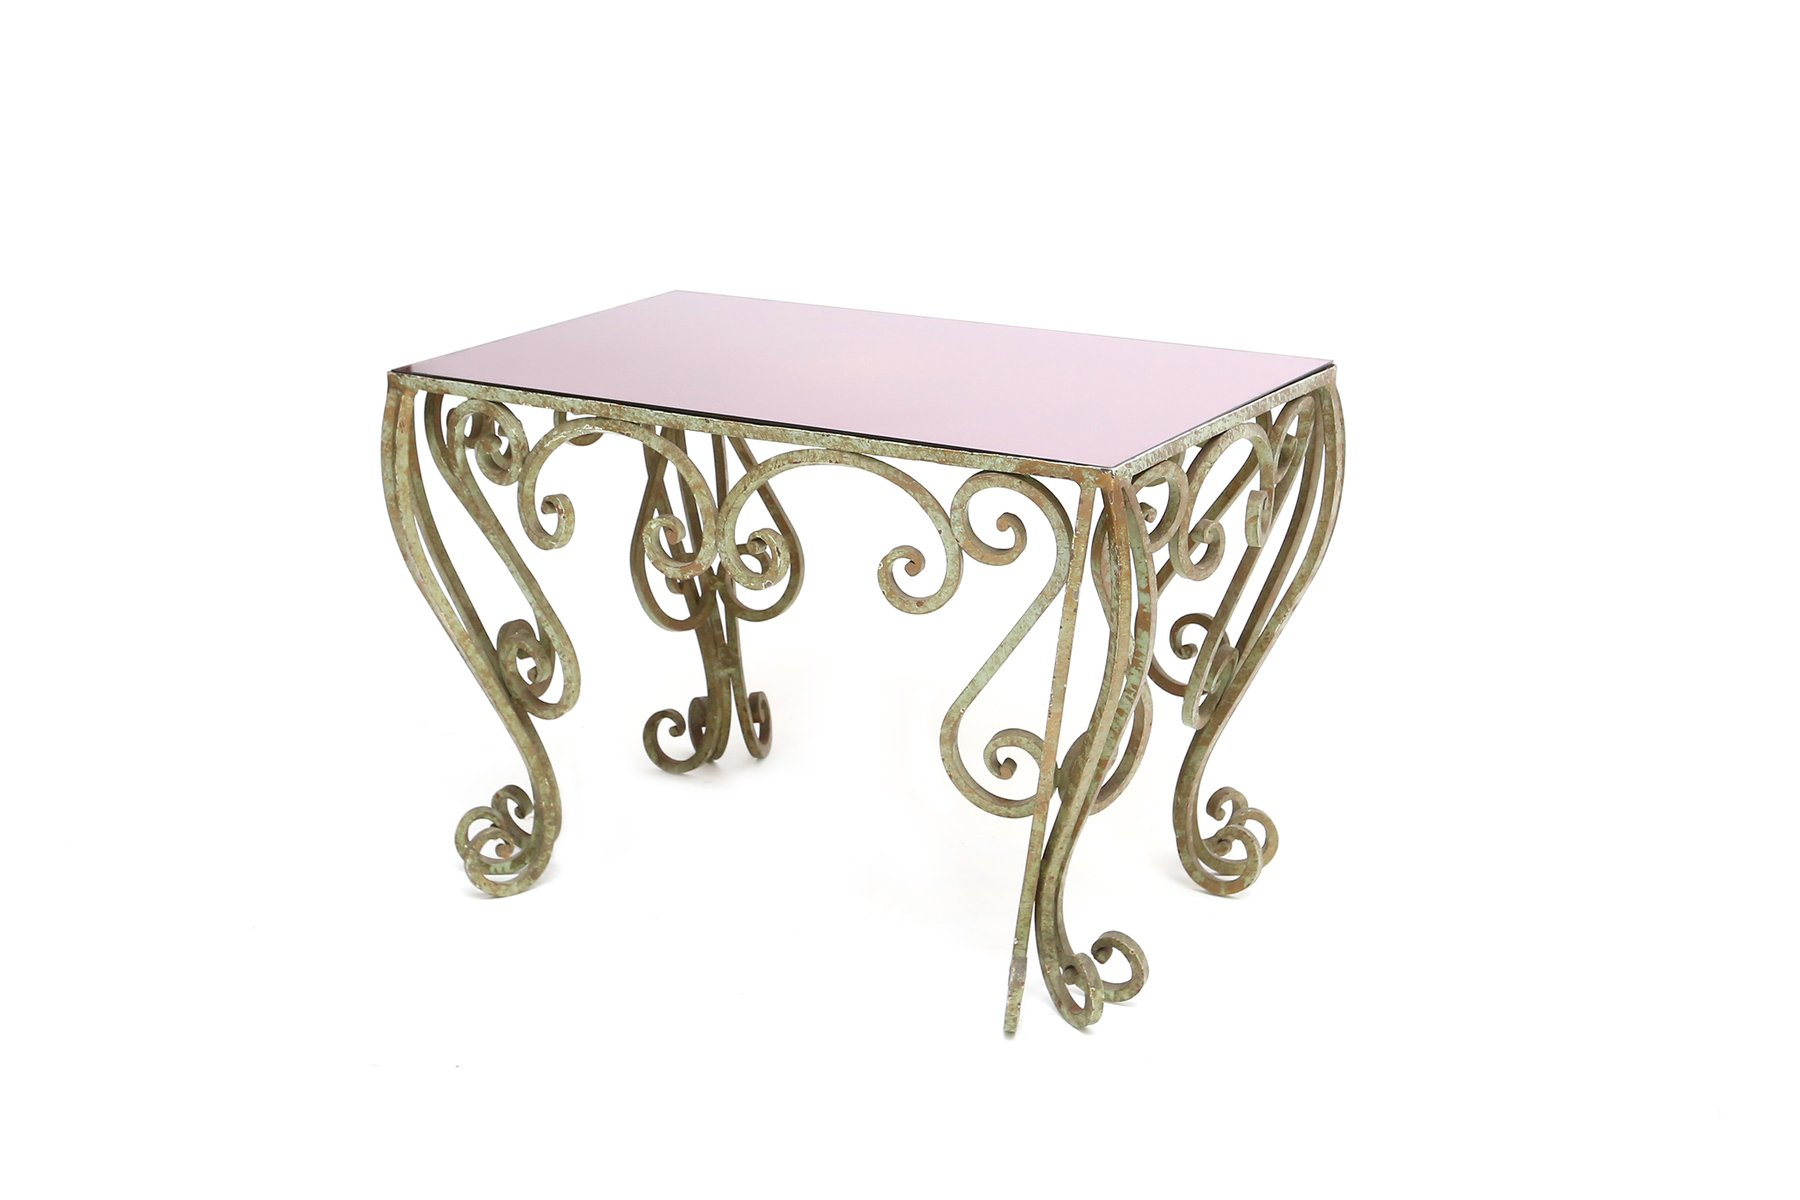 table basse en fer forg avec verre miroir violet en vente sur pamono. Black Bedroom Furniture Sets. Home Design Ideas